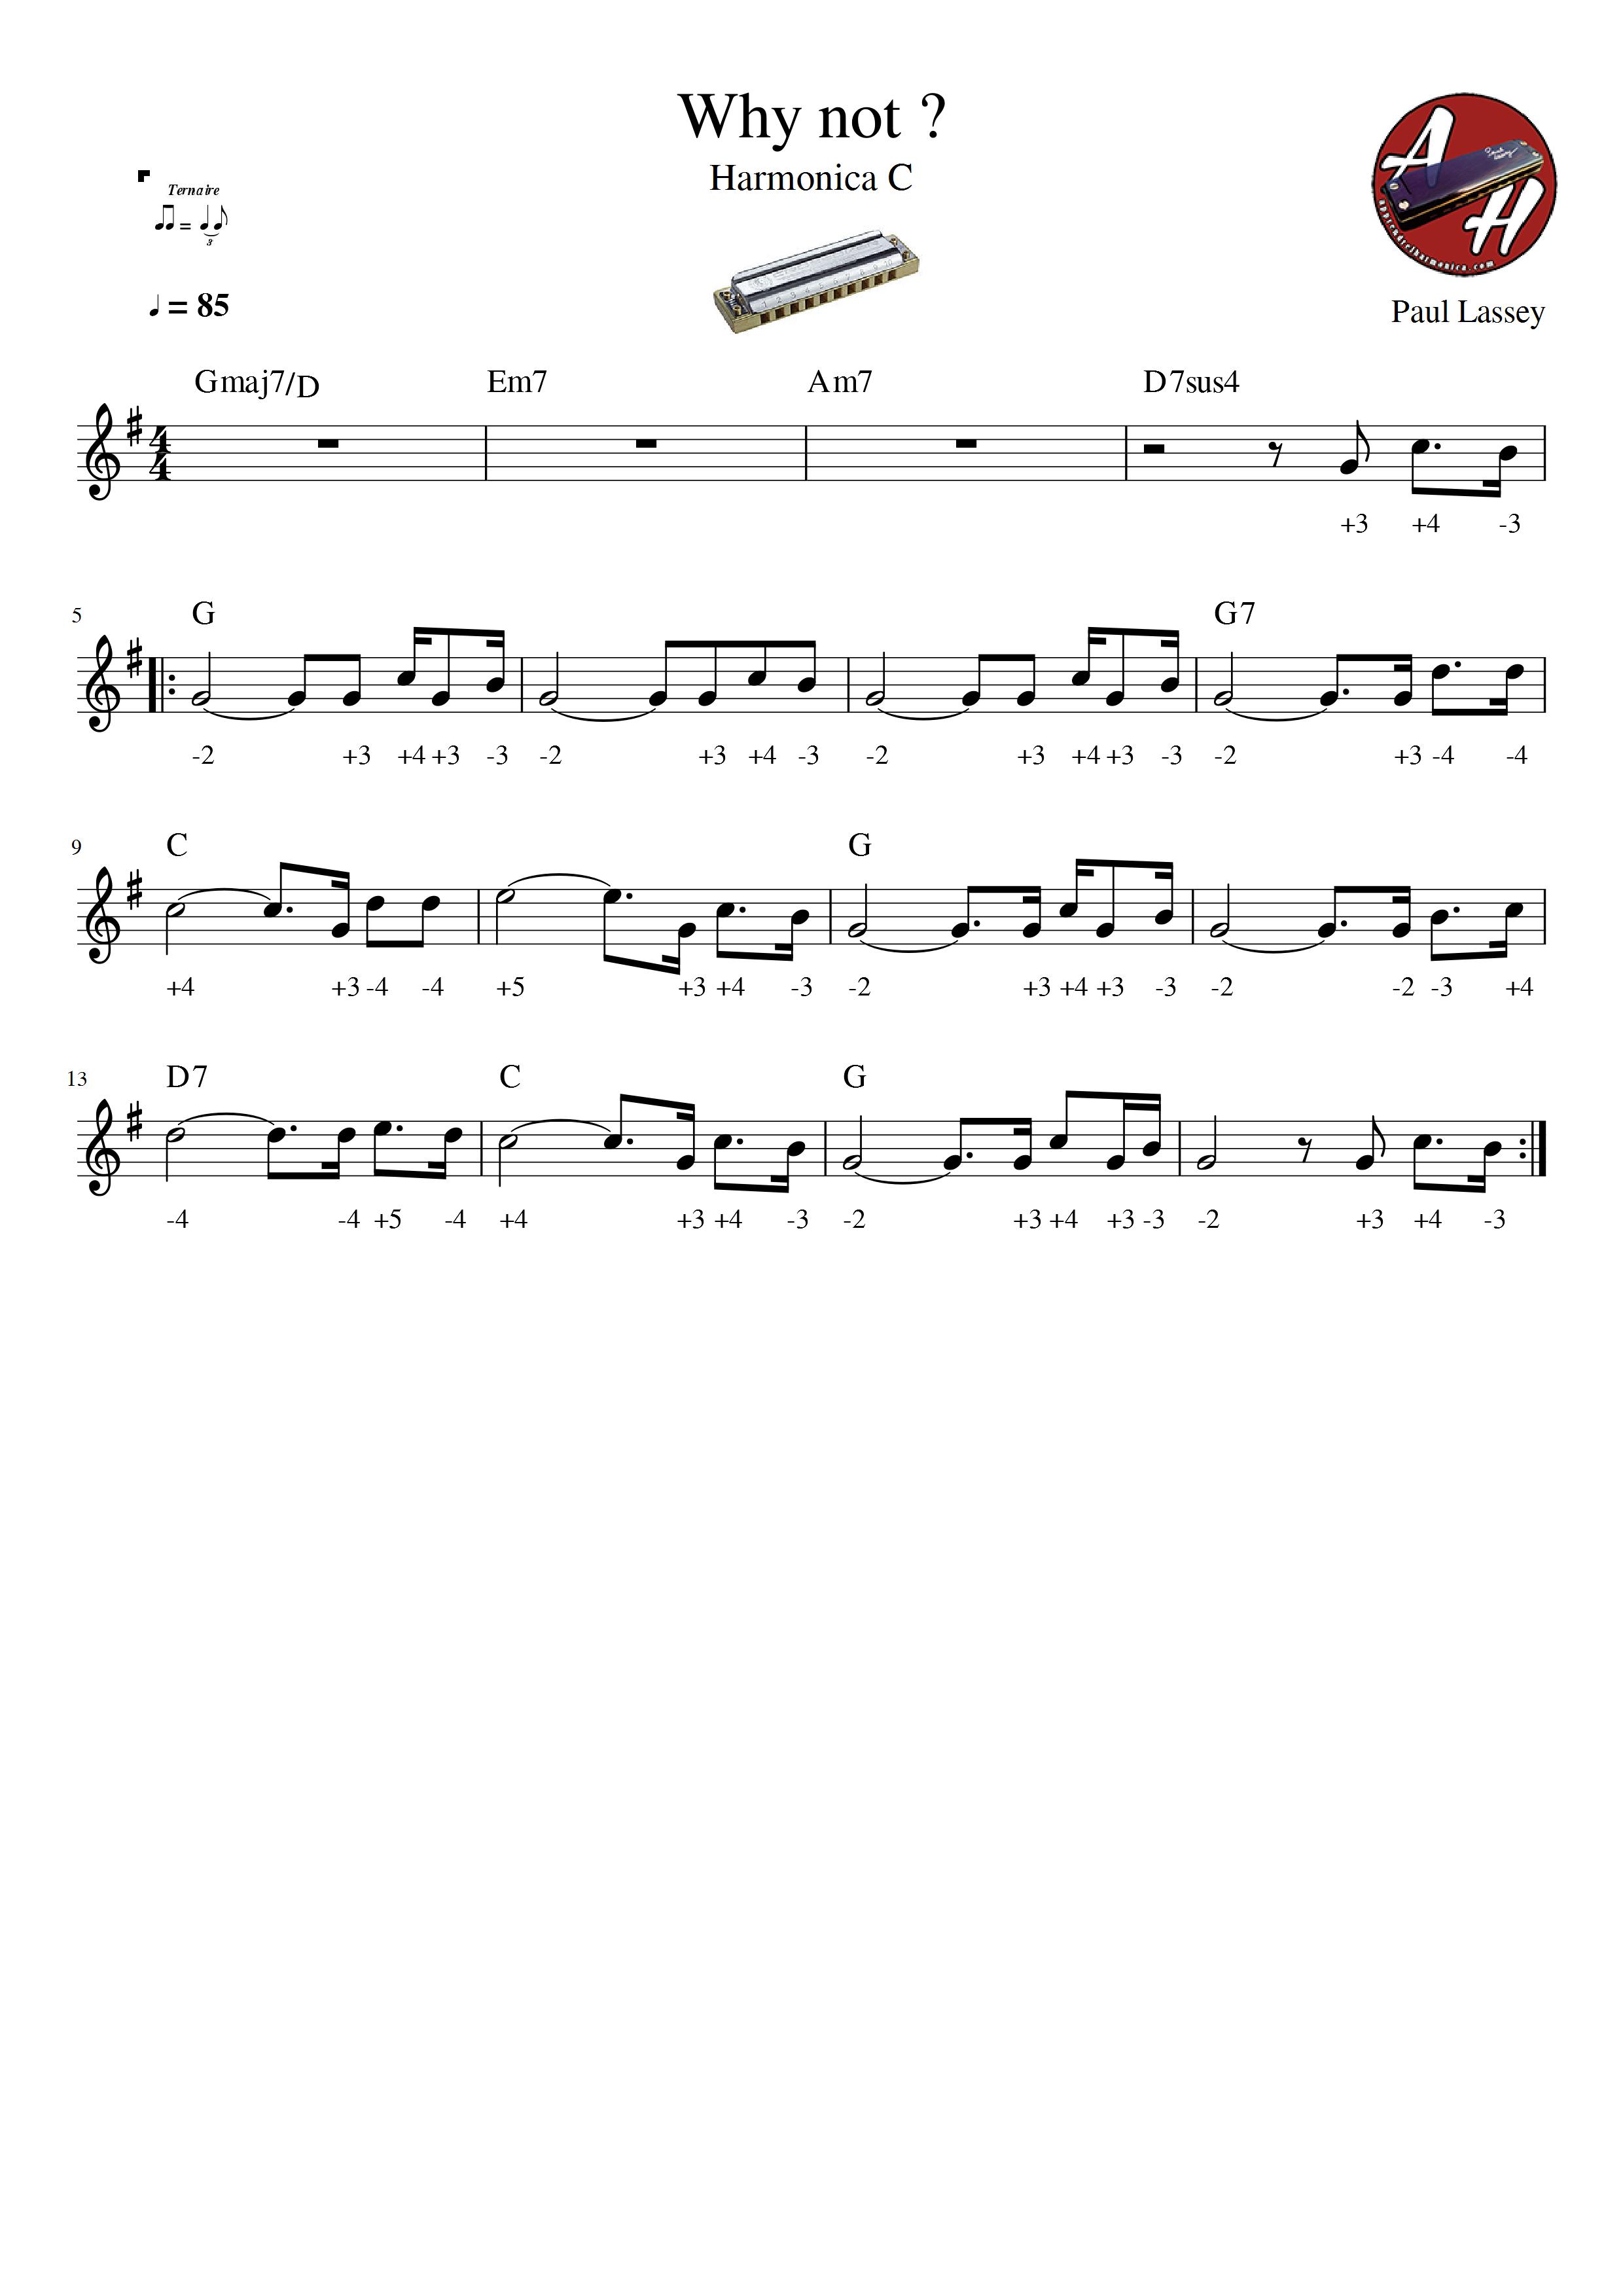 Why not - Paul Lassey - Harmonica C